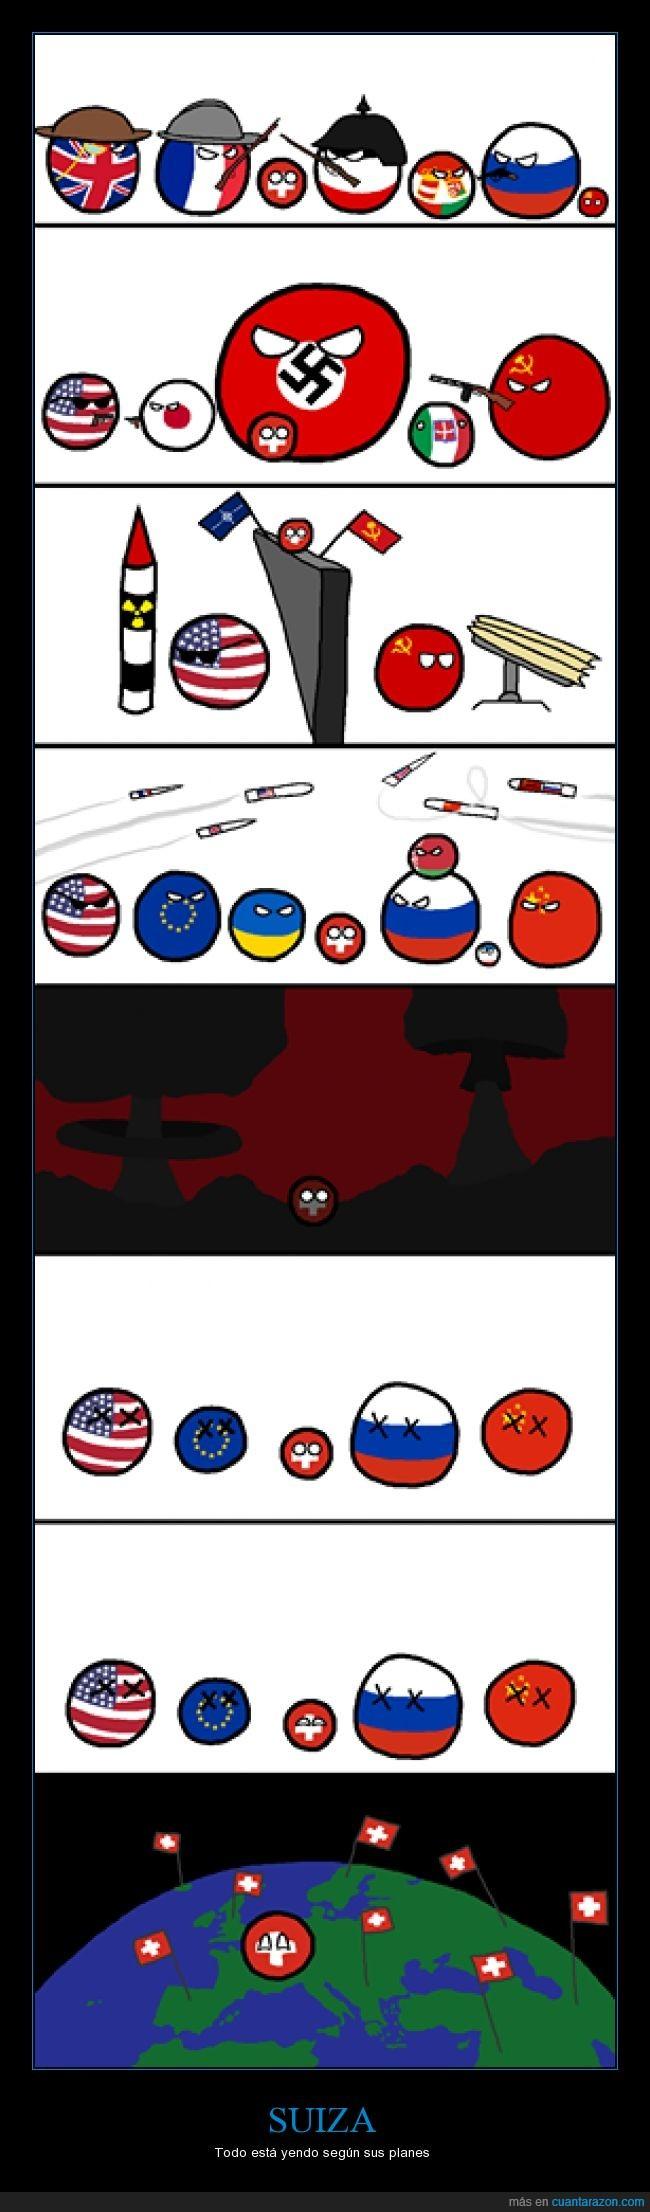 Alemania Nazi,Bielorrusia,China,Crimea,Dominio del mundo,Francia,Imperio Aleman,Imperio AustroHungaro,Japon,Polandball,Reino de Italia,Reino Unido,Rusia,Suiza,Ucrania,Union Europea,URSS,¡Arrodillense todos ante Suiza!